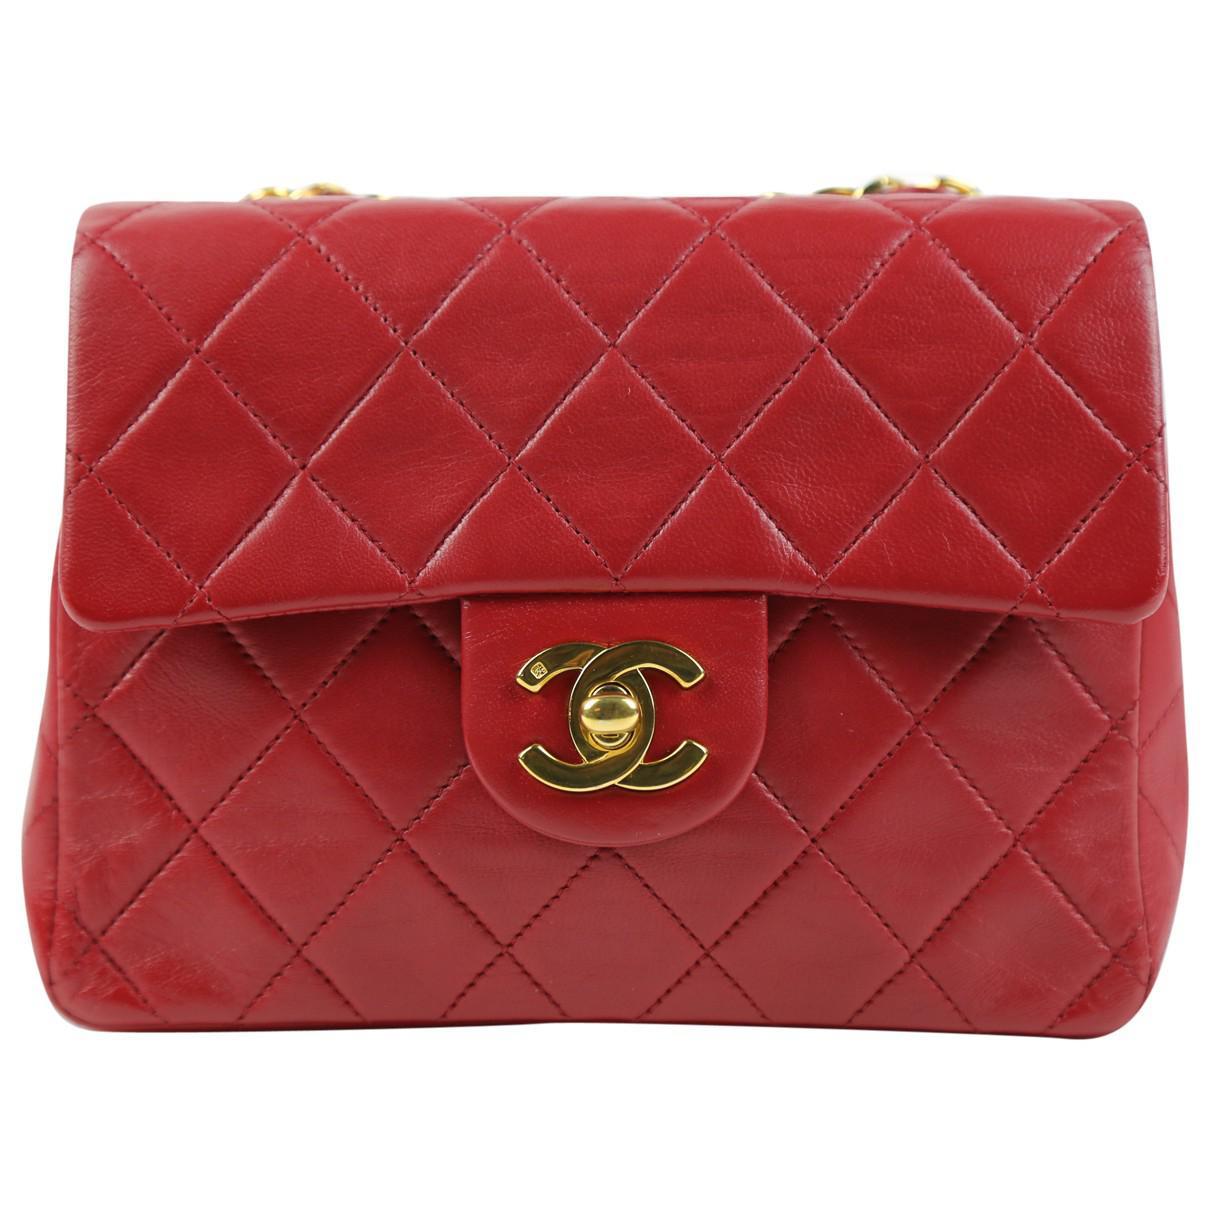 Chanel Pre-owned - Timeless leather mini bag uMdYa9oA